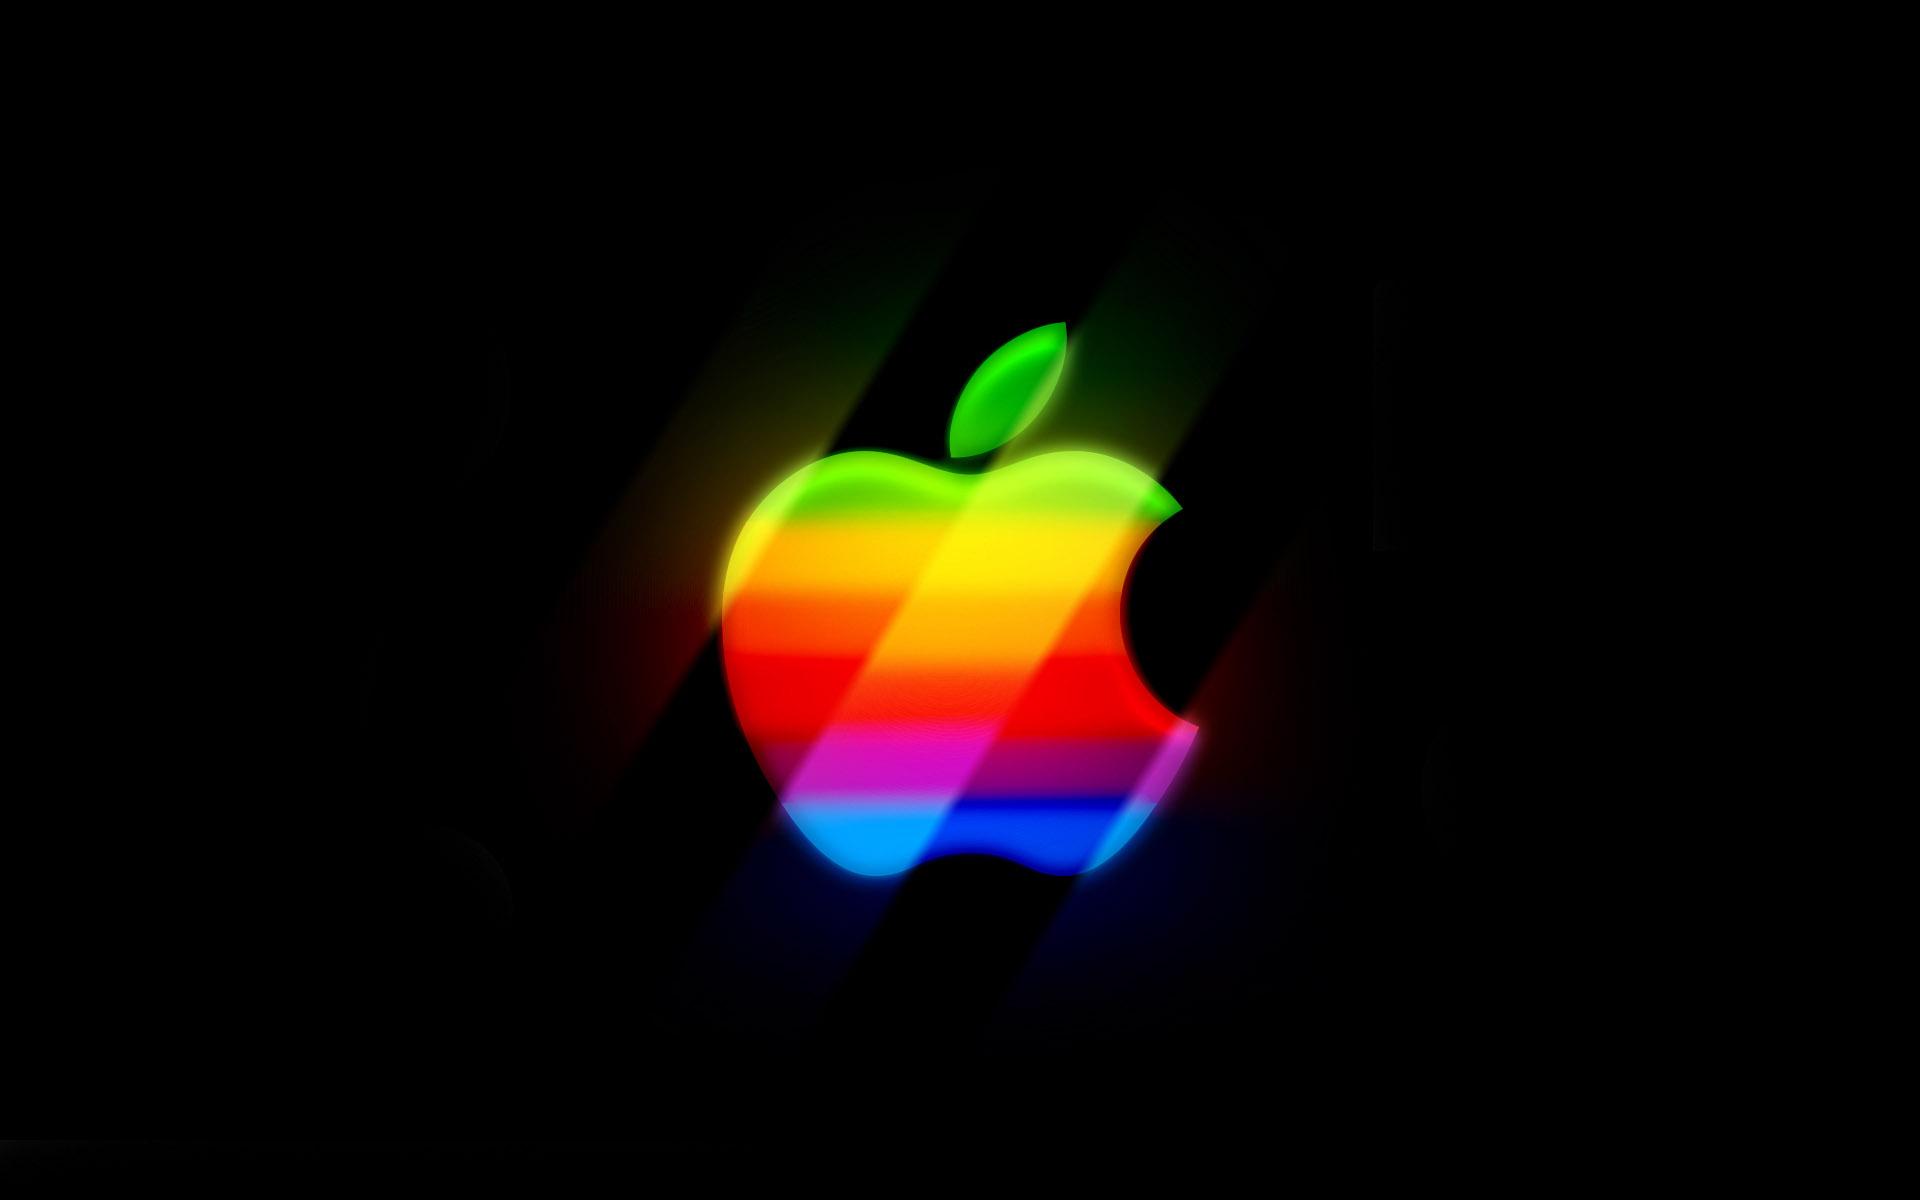 Apple Mac Wallpapers - Apple Wallpaper 2011 , HD Wallpaper & Backgrounds